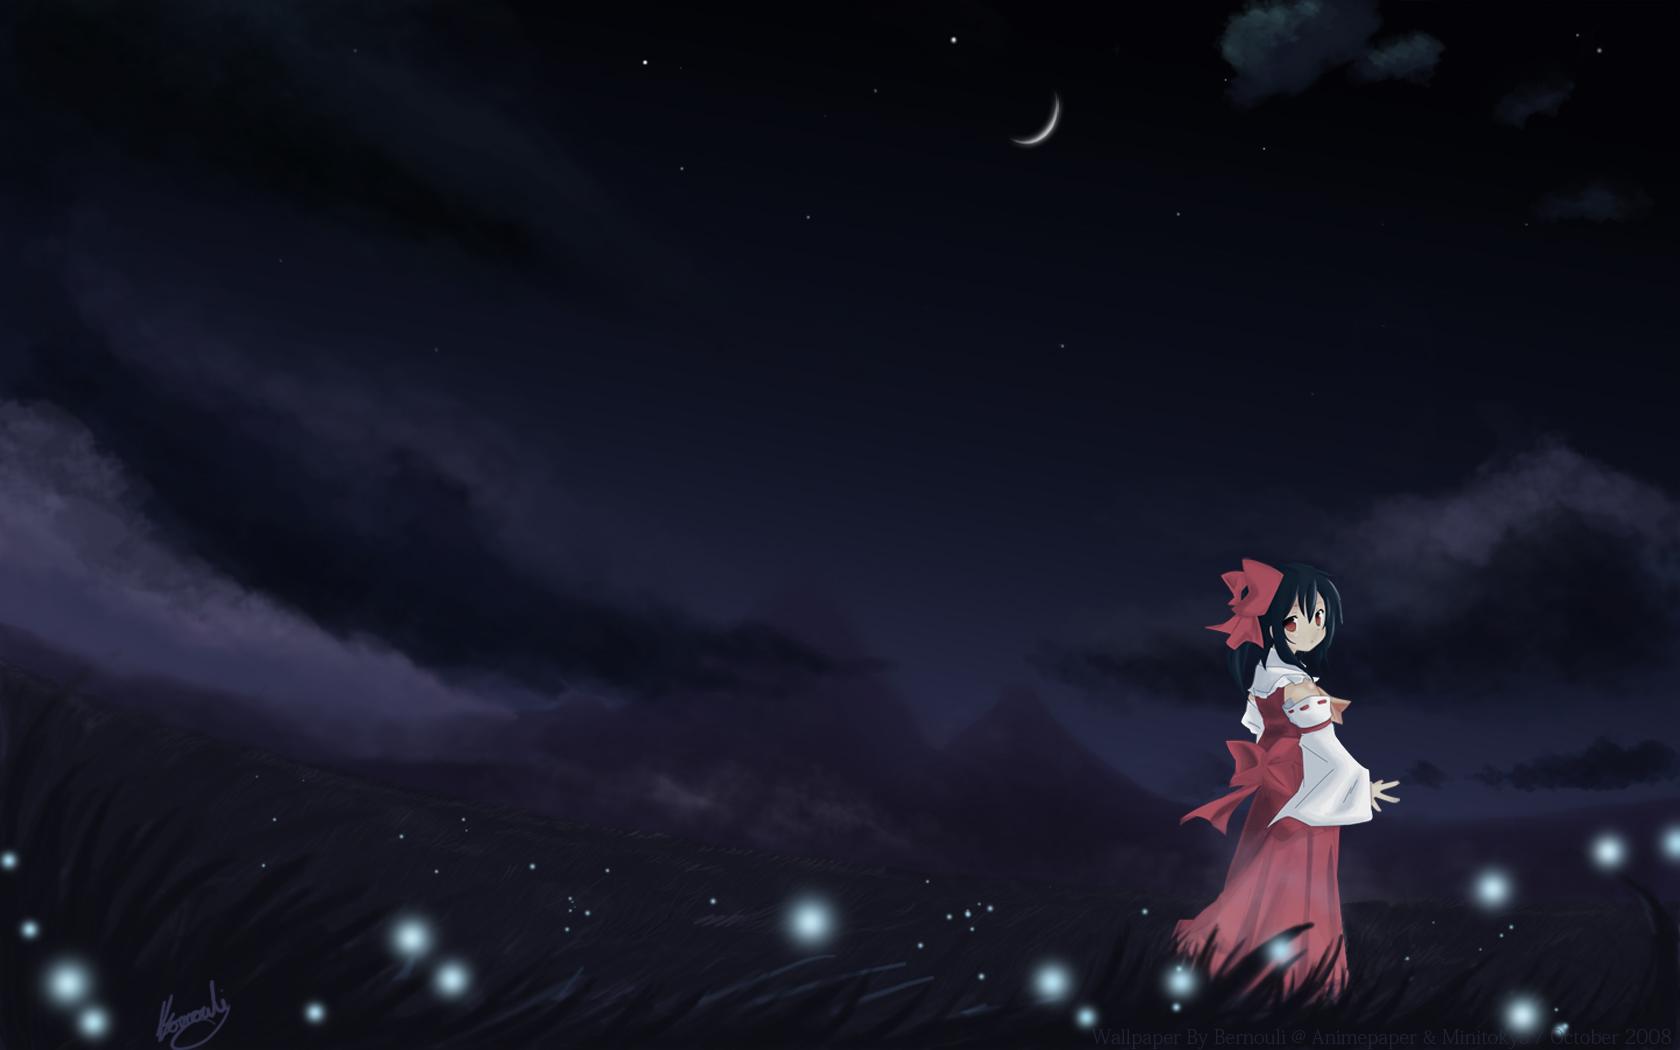 black_hair bow clouds dark grass hakurei_reimu japanese_clothes miko moon night red_eyes short_hair signed sky stars touhou watermark